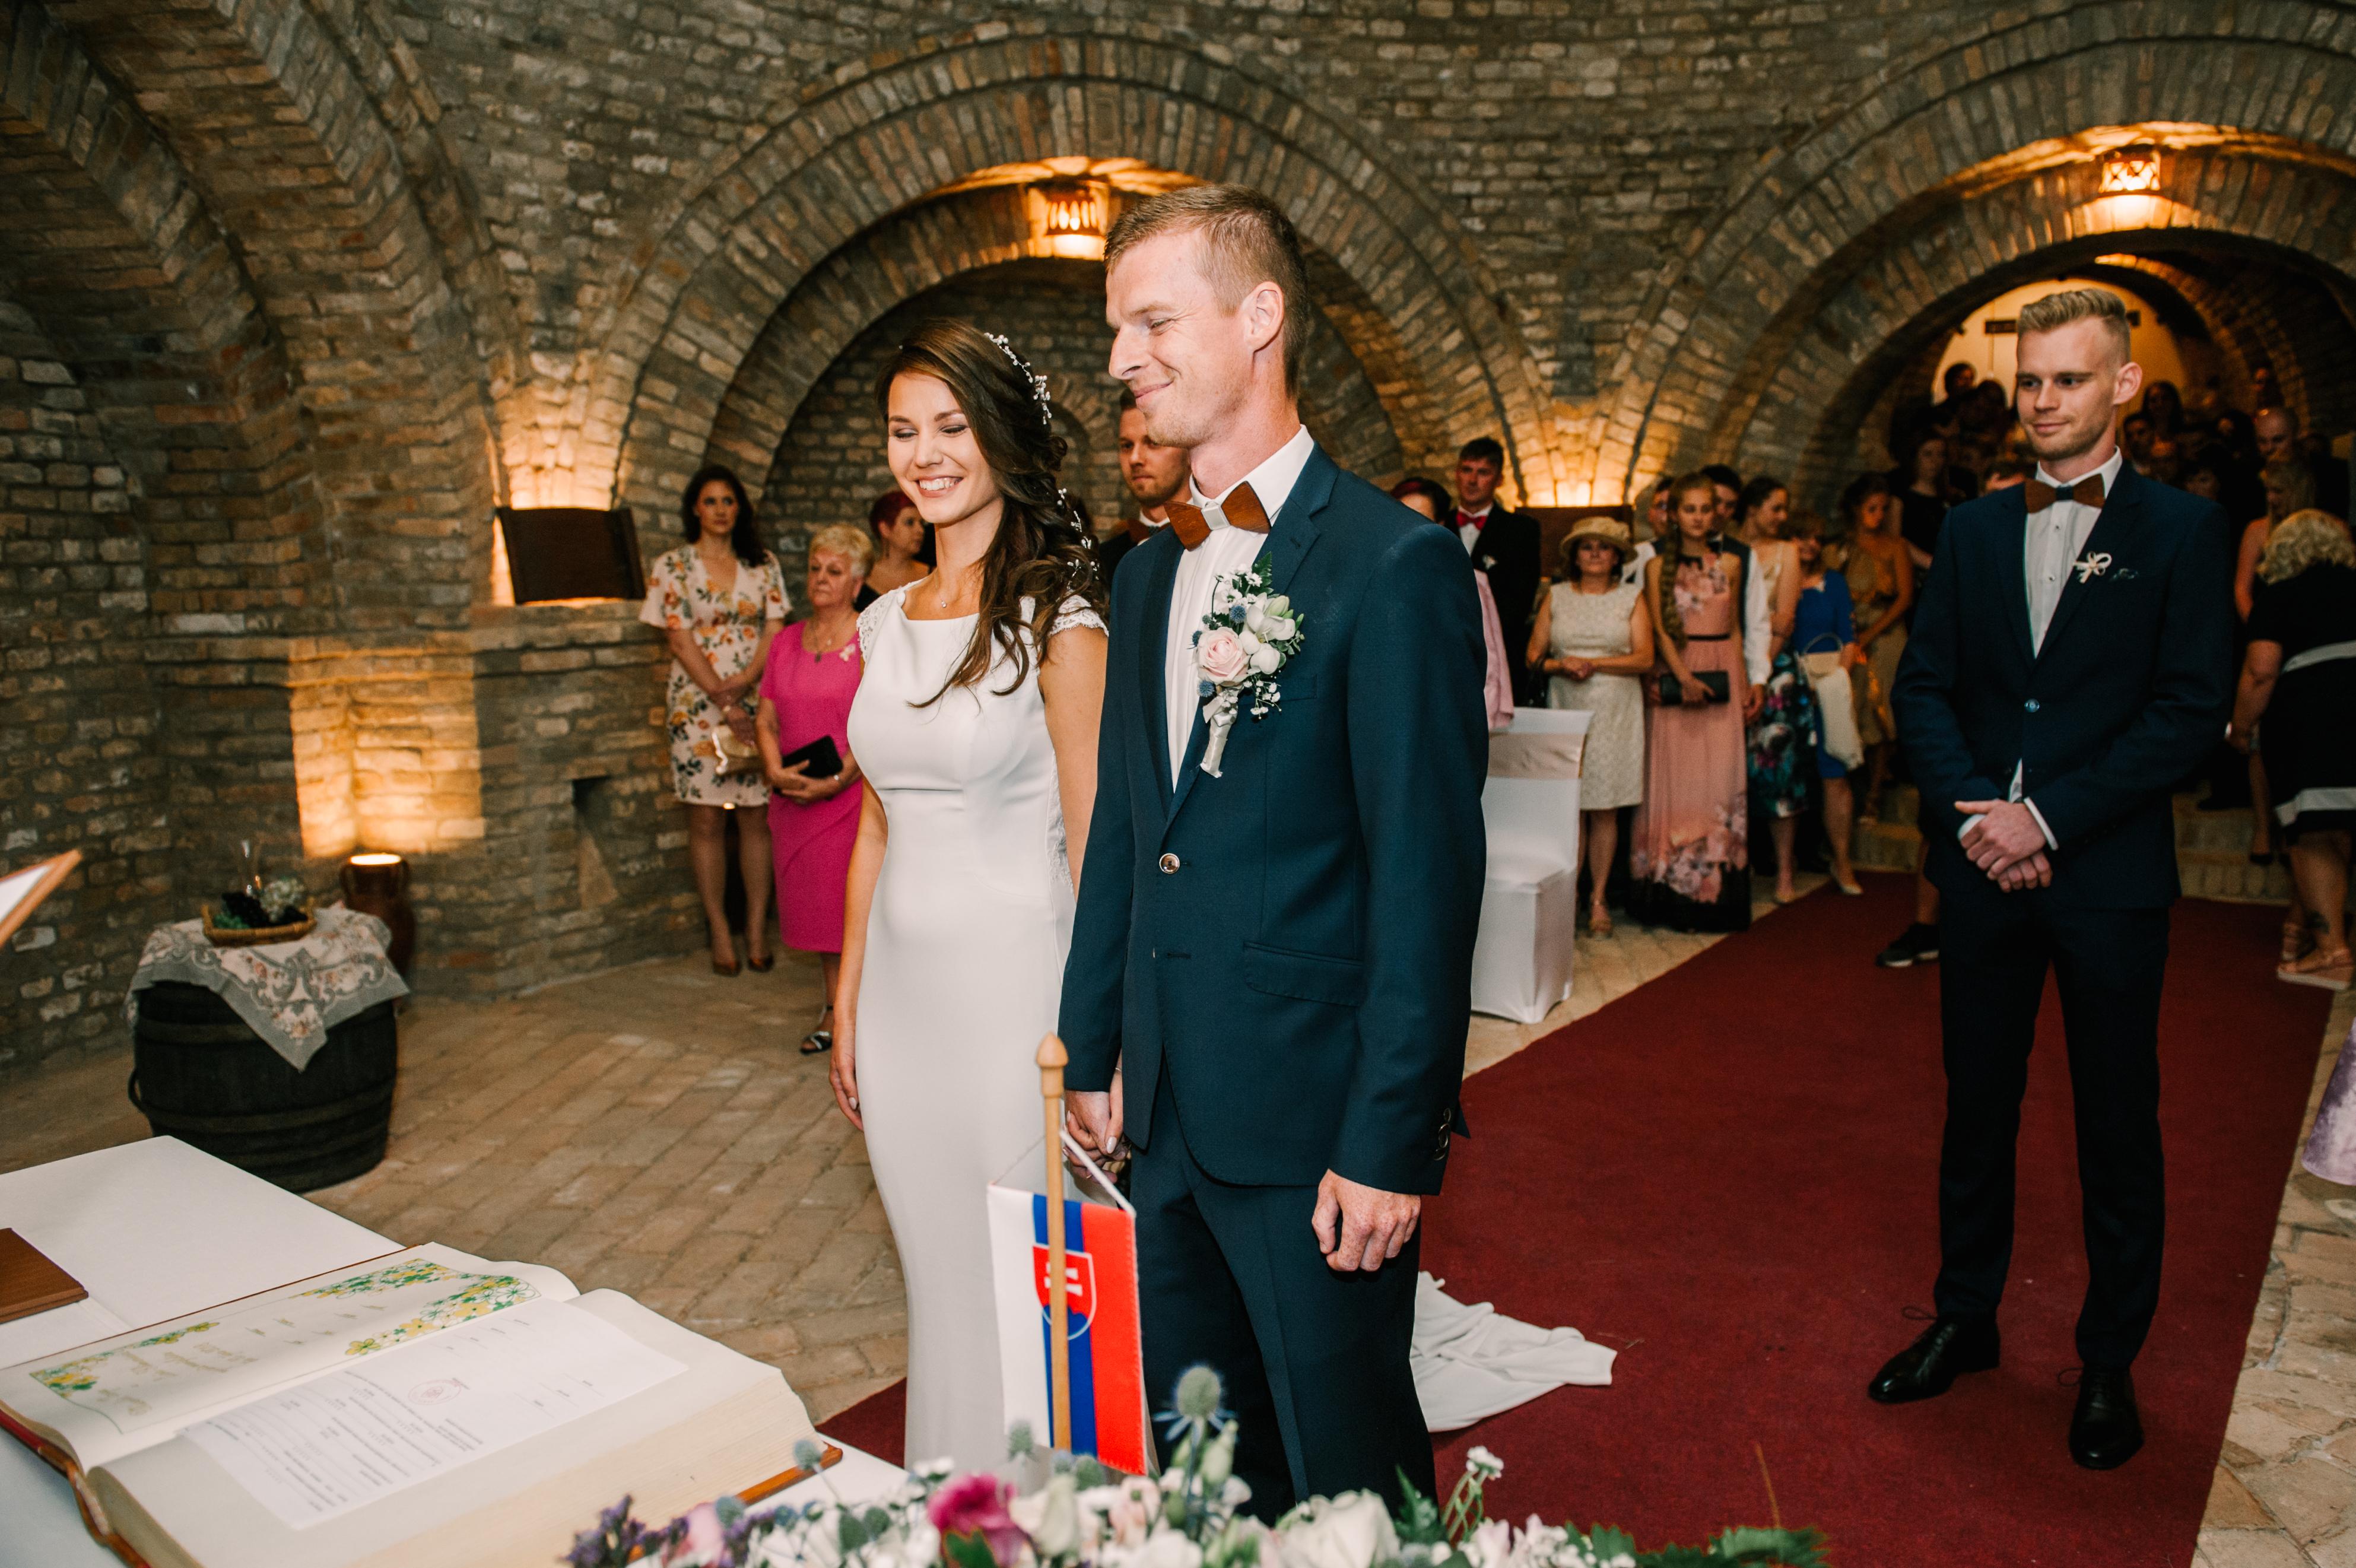 Svadba St. Petrus, Svätý Peter 01, #svadobnyDJ, #djanasvadbu, #svadba, #stpetrusvini